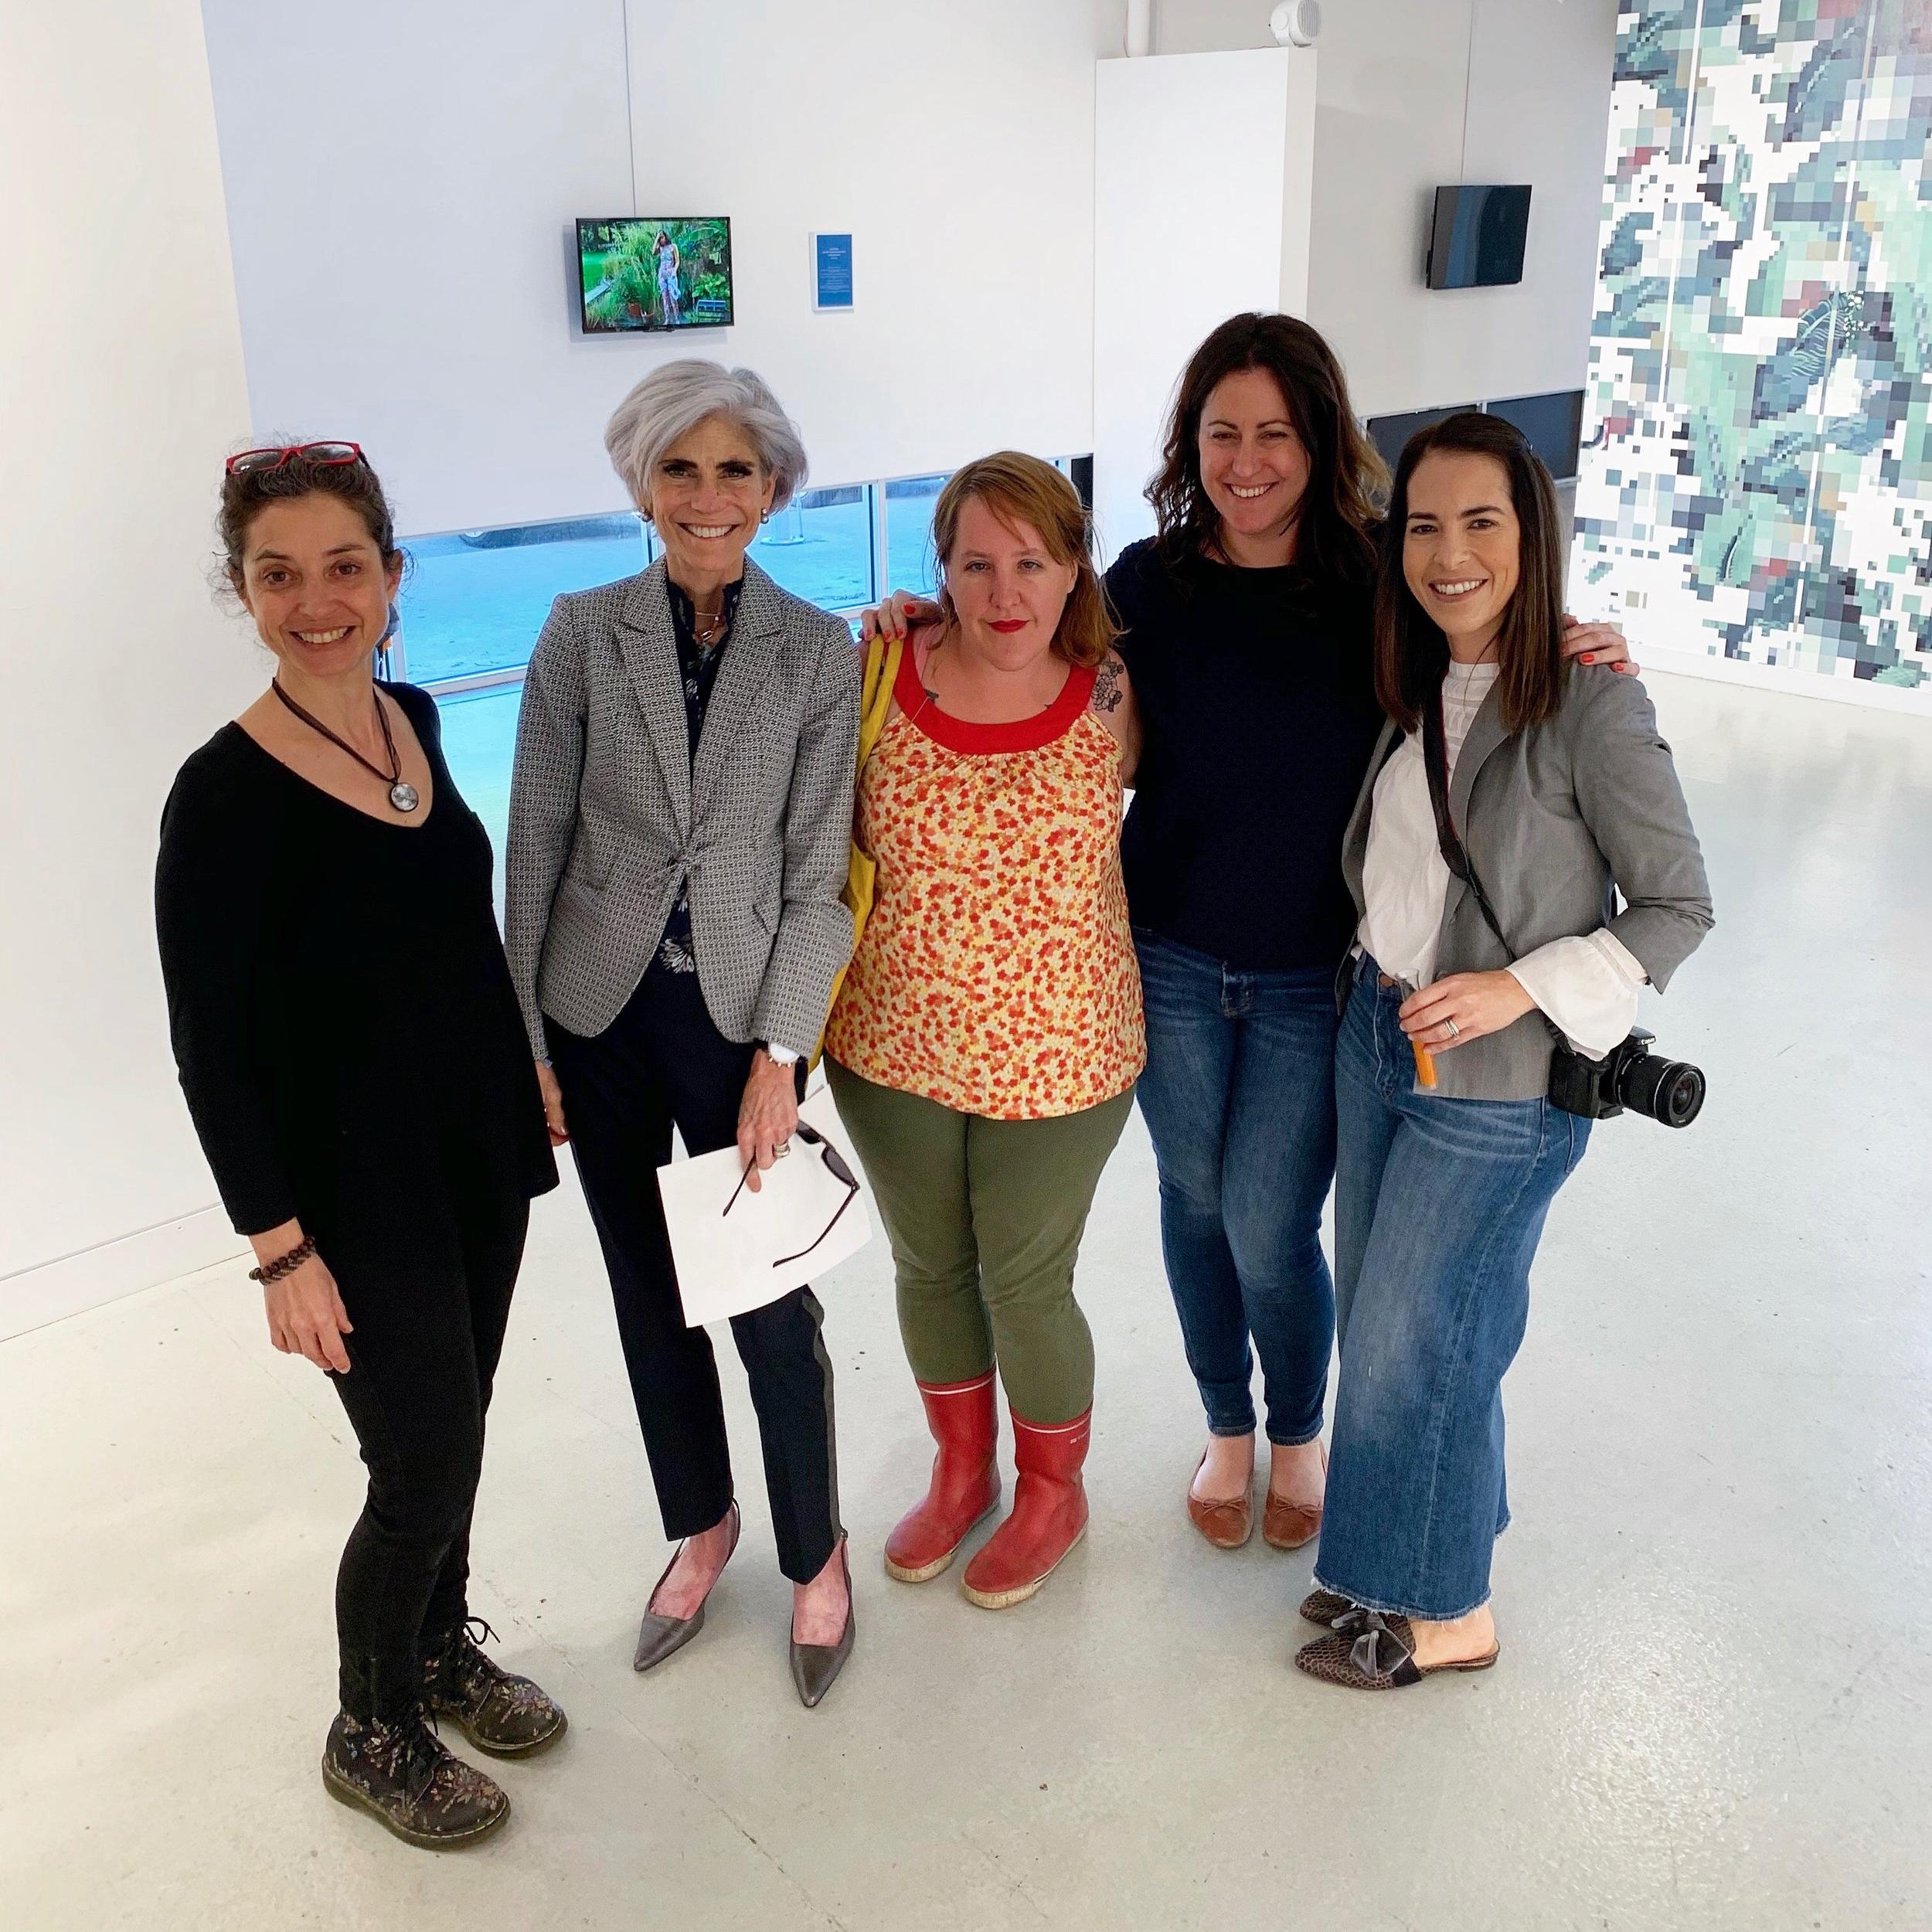 Anne Houang, Judy Nyquist, Ceci Norman, Laura Matesco & Mariana Cano